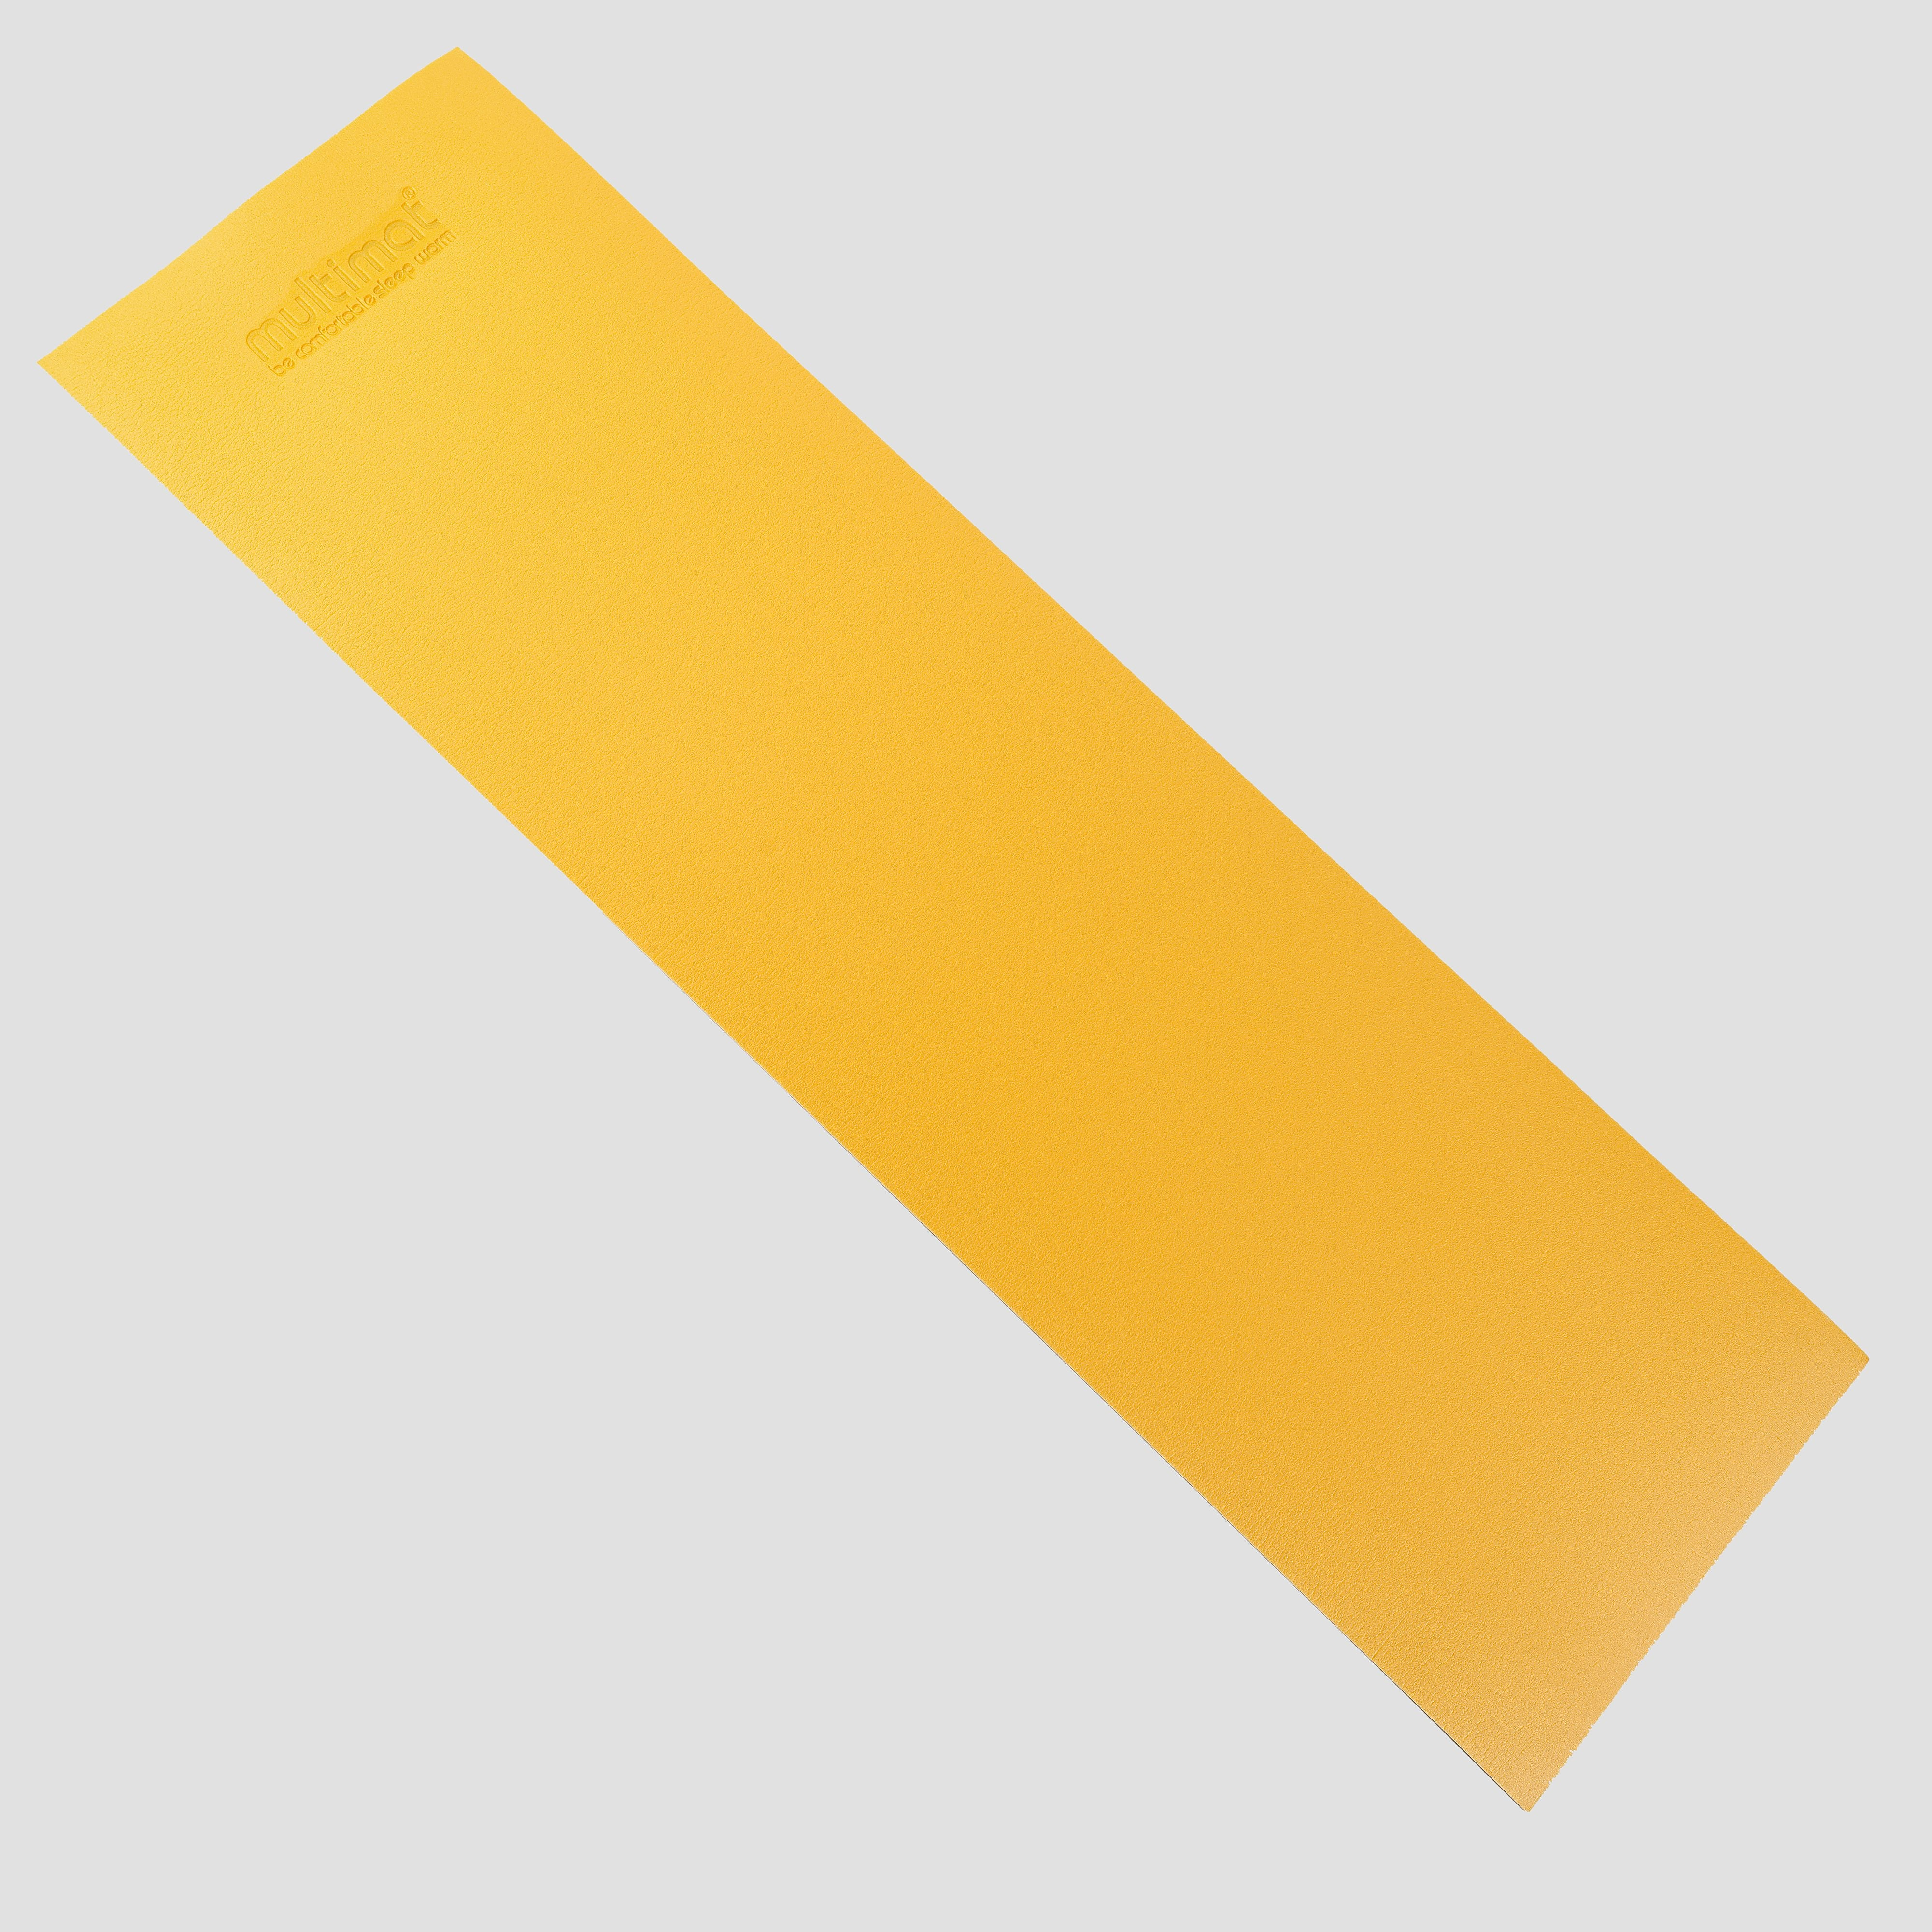 Multimat Backpacker 3-Season Roll Mat